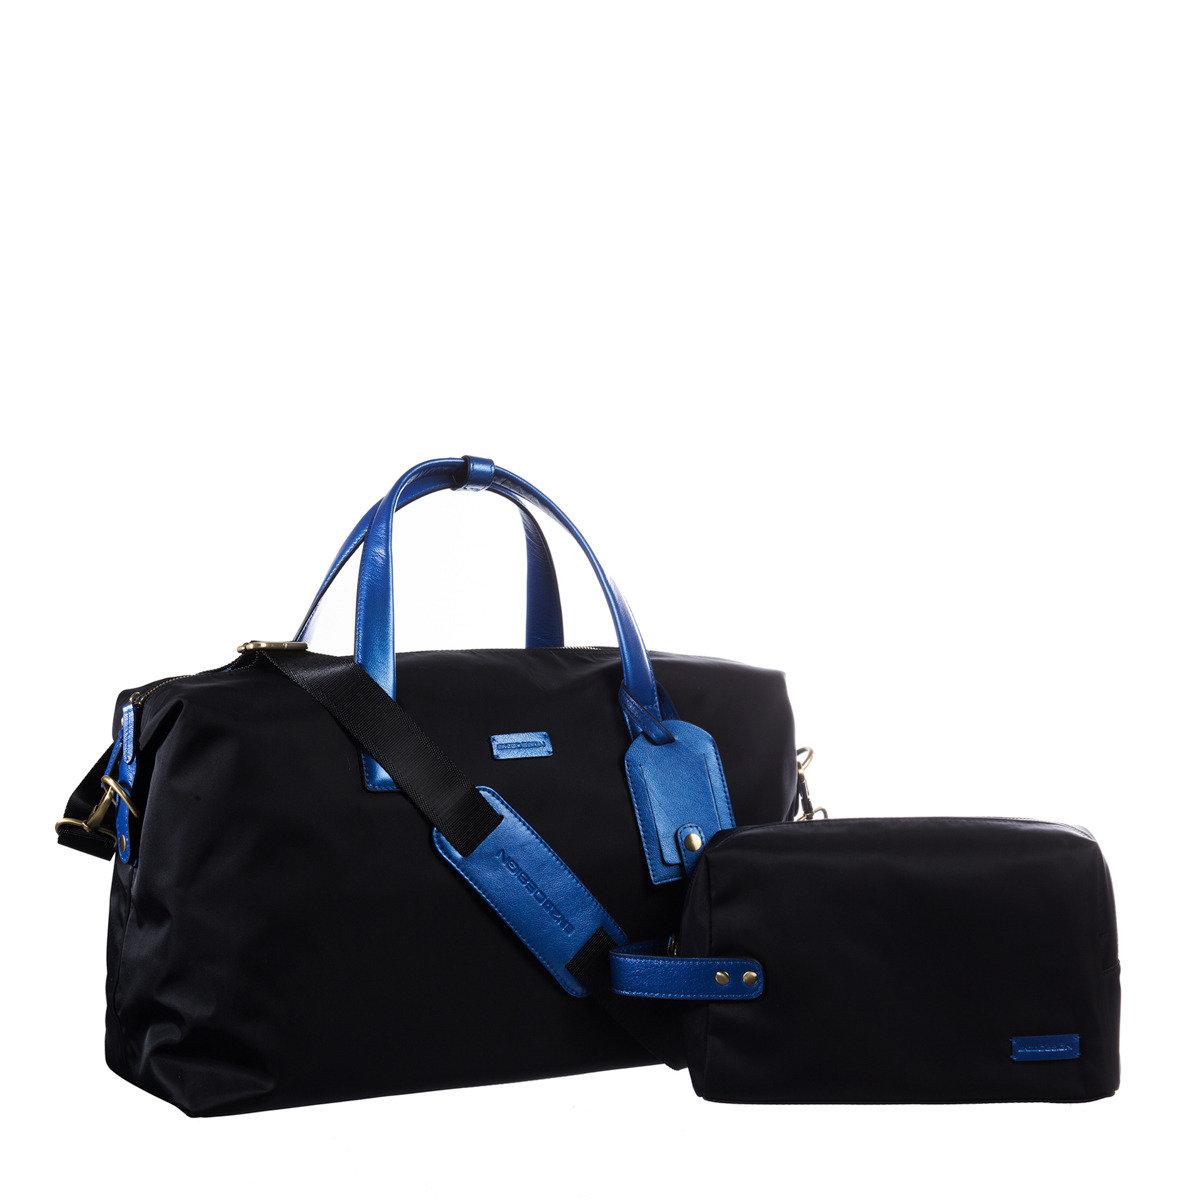 Soccer Boot Leather Trim 系列運動旅行袋及梳妝袋套裝 (限量10套)